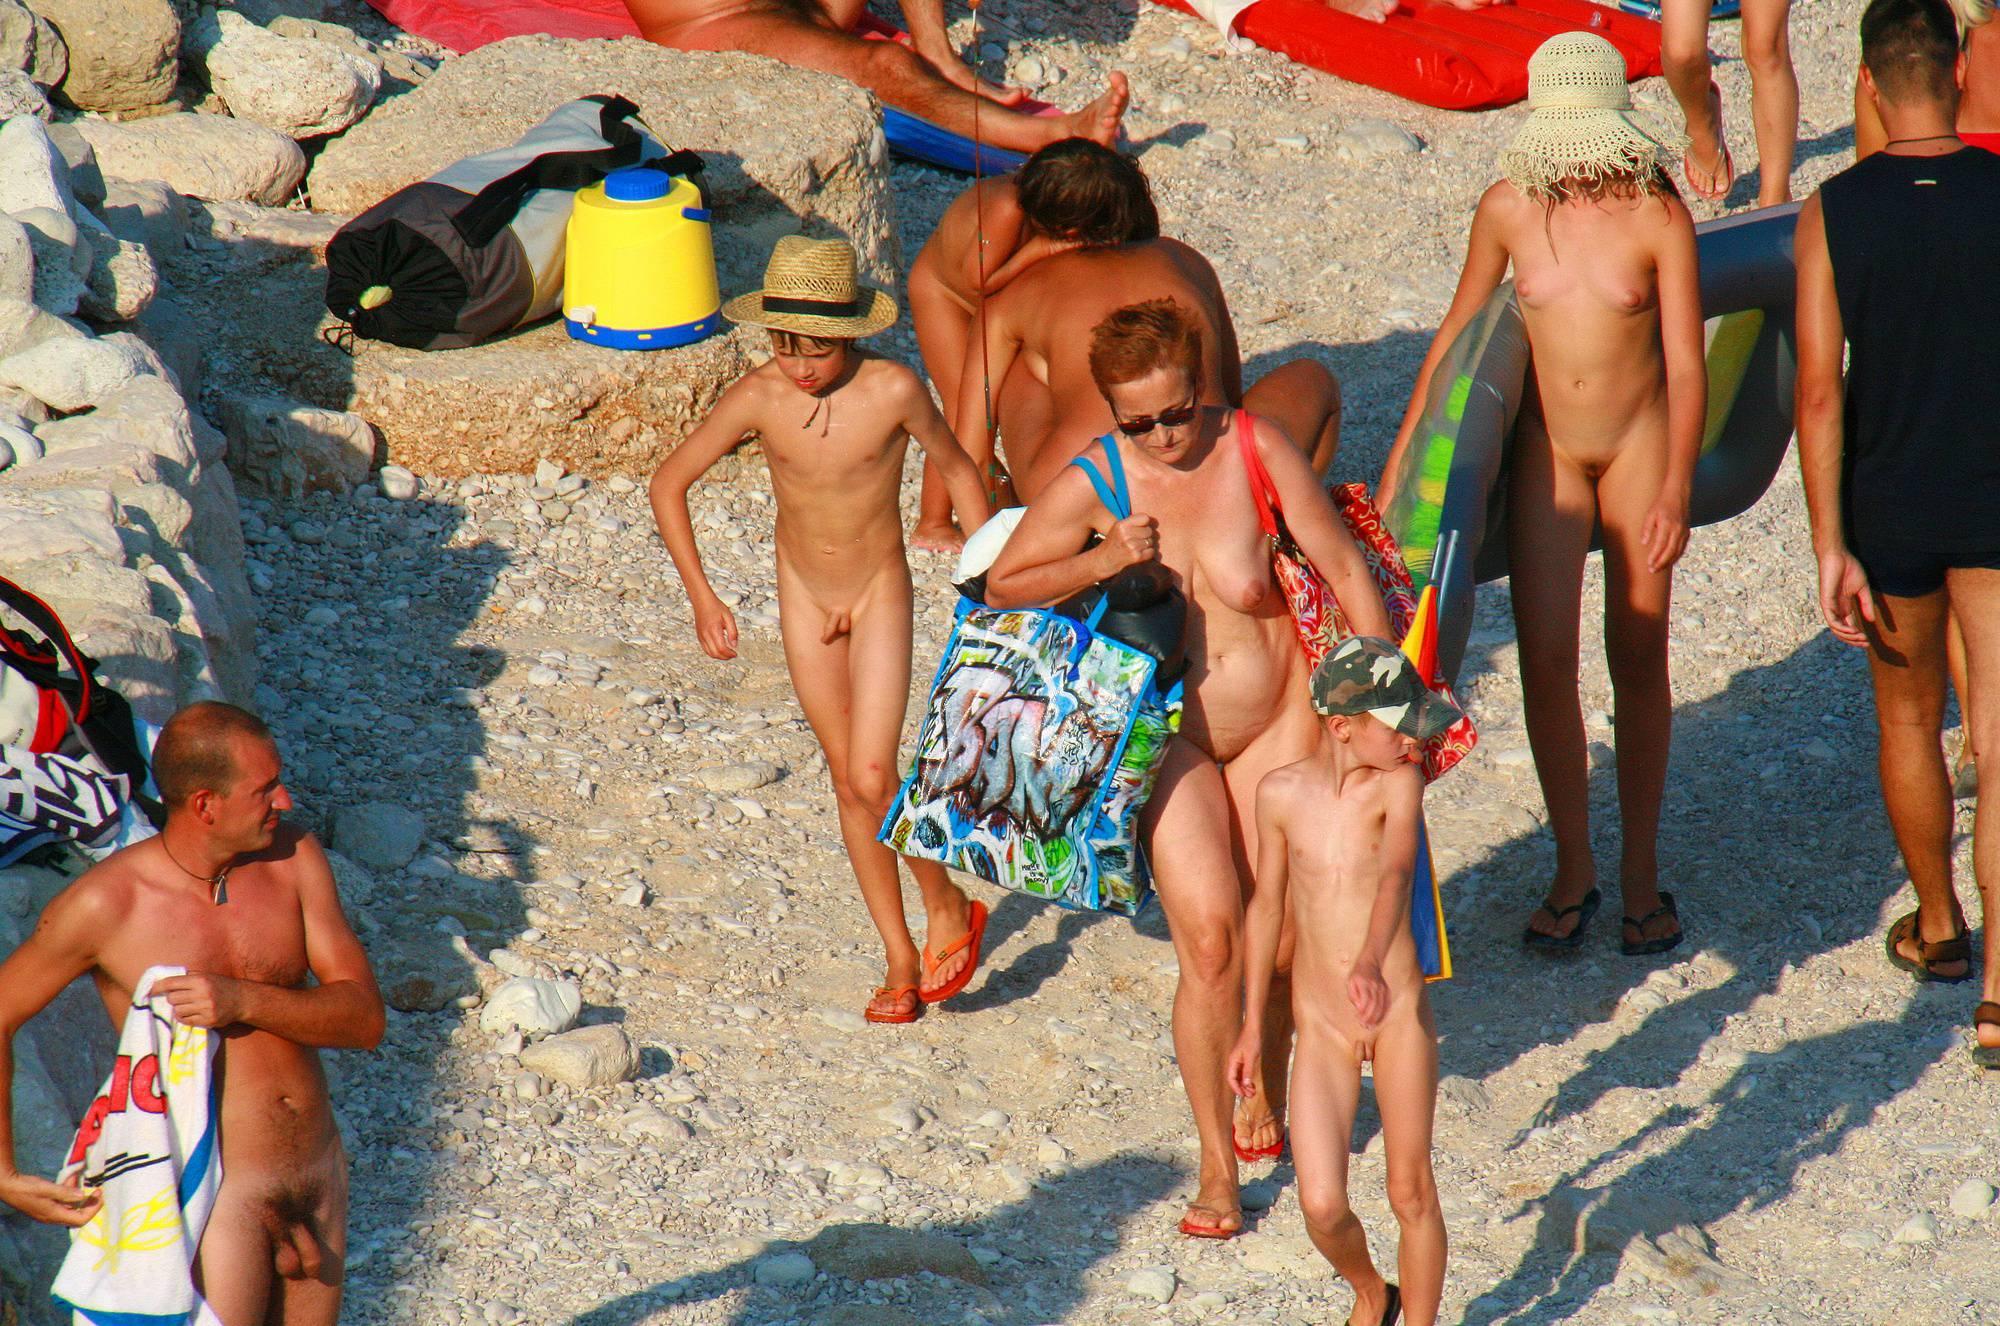 Pure Nudism Pics-Ula FKK Beach Family Area - 3